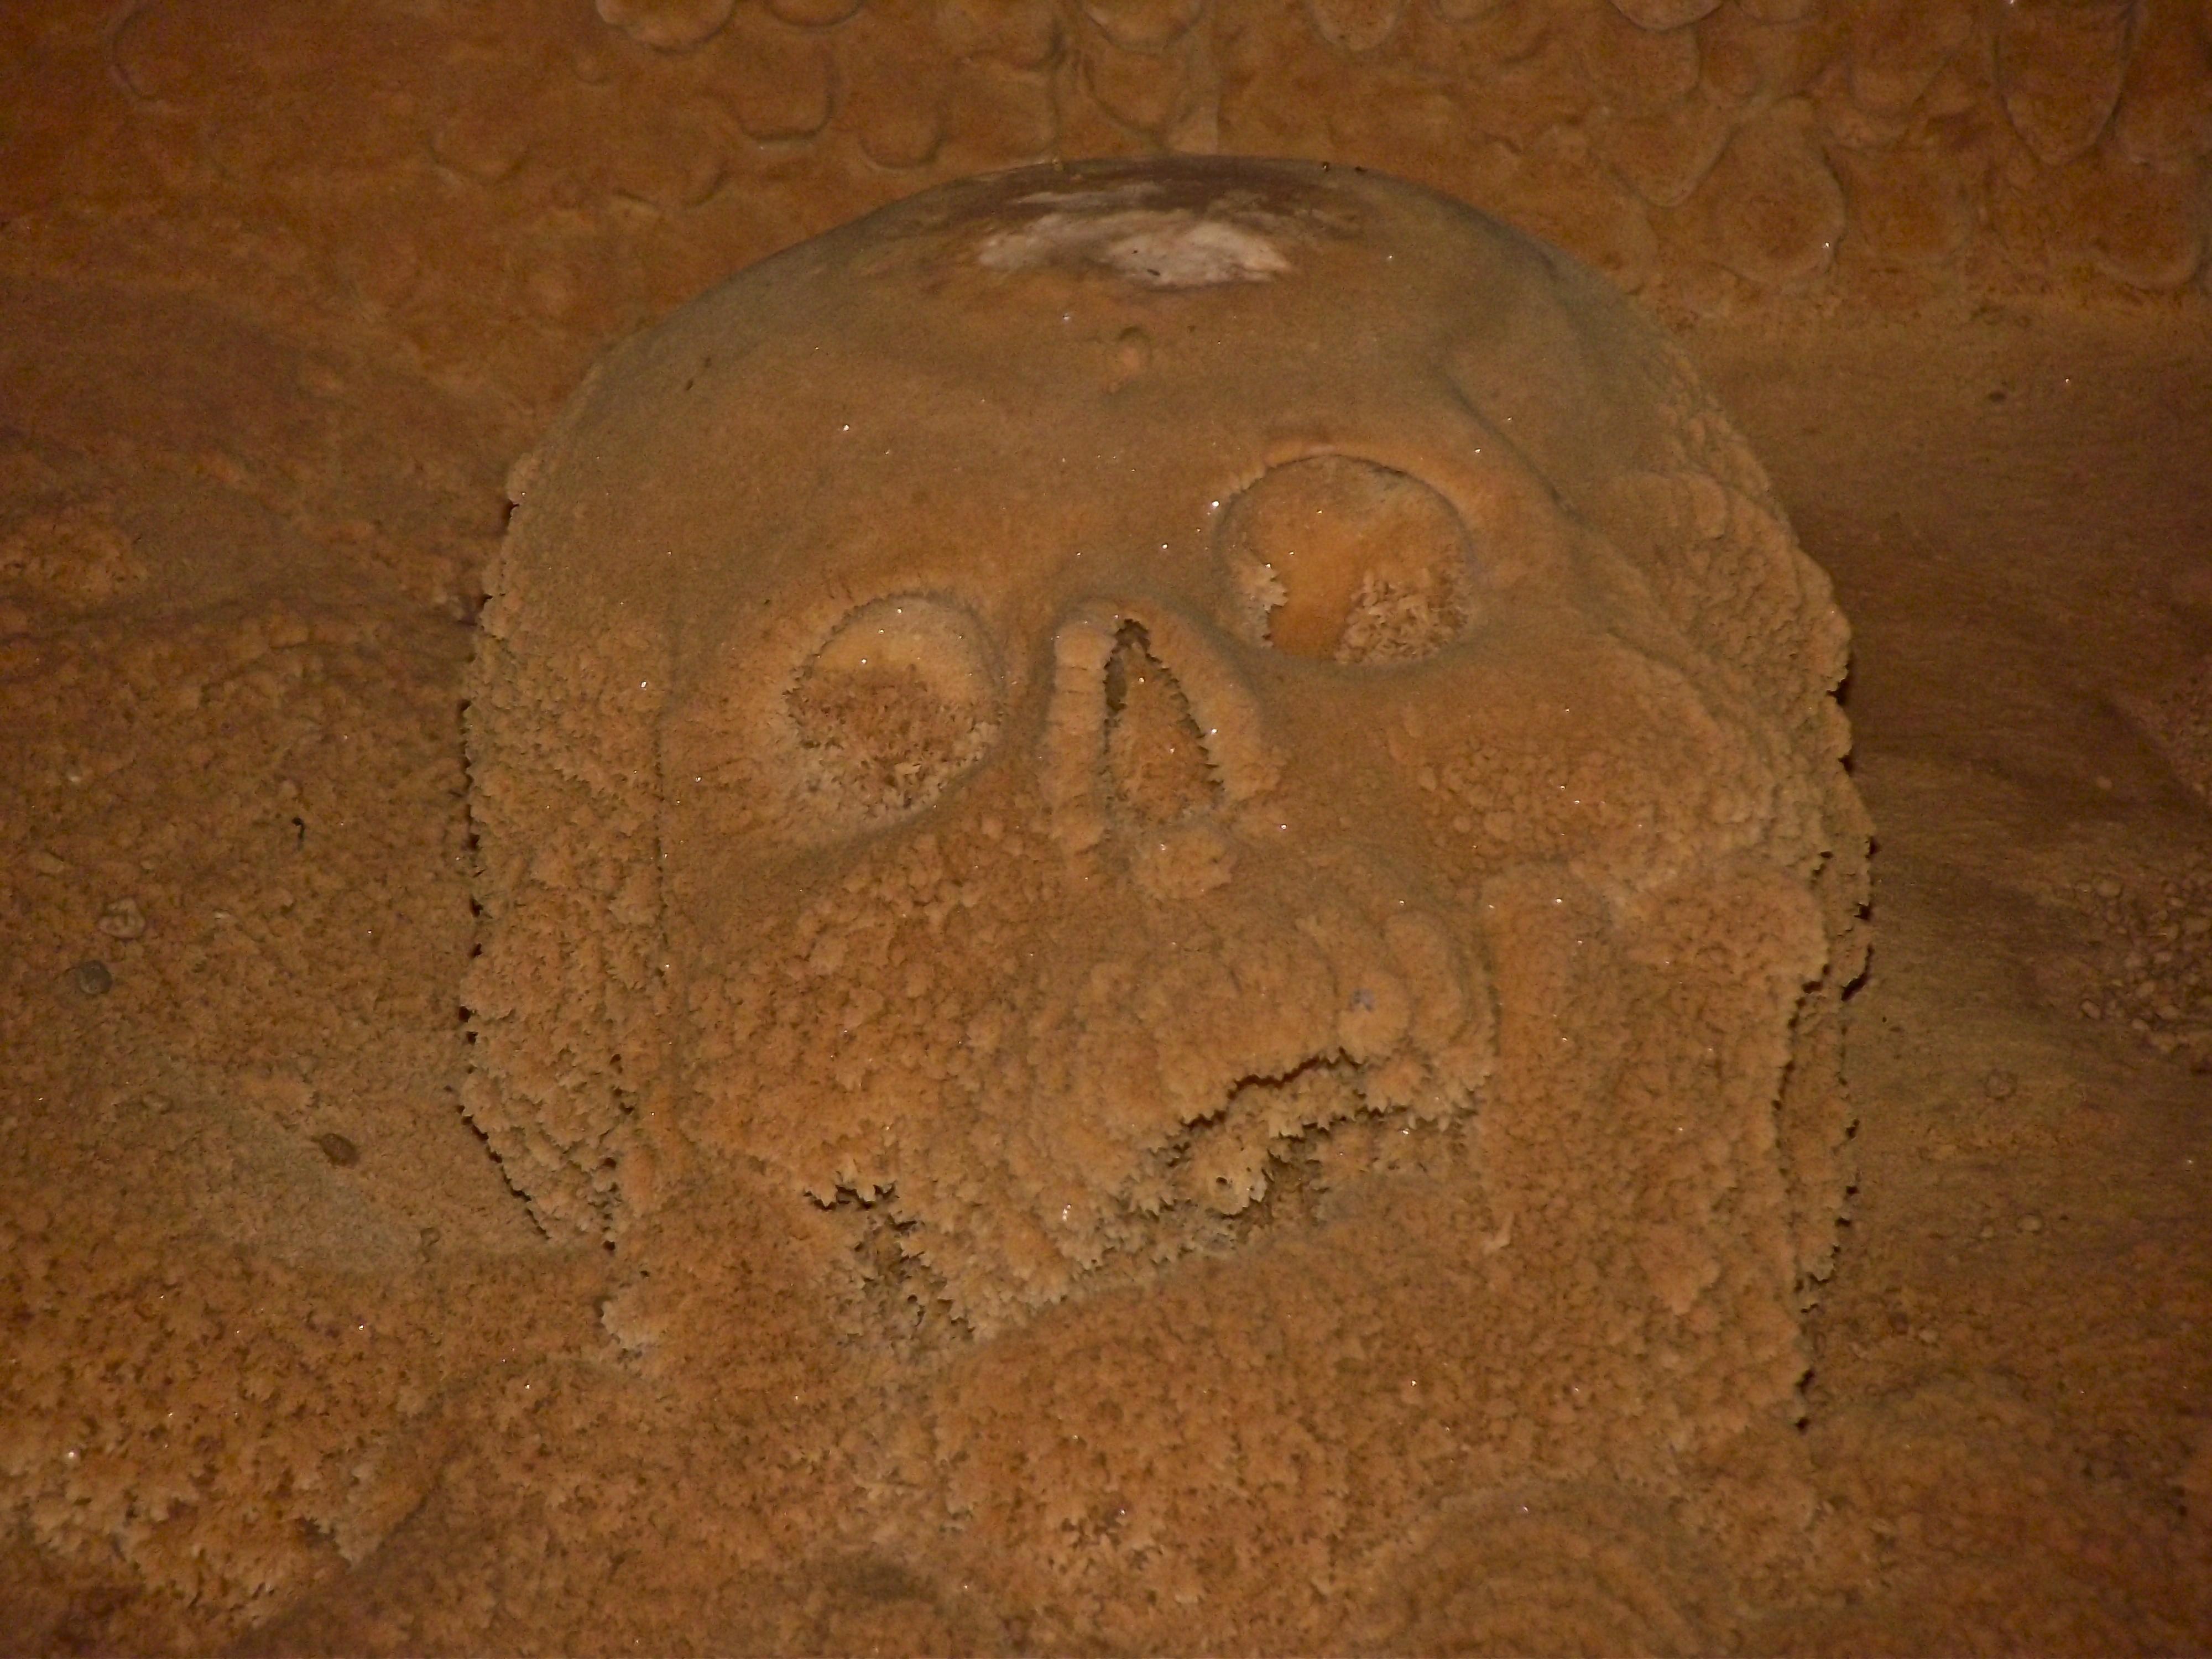 артефакты пещеры хрустальной девы